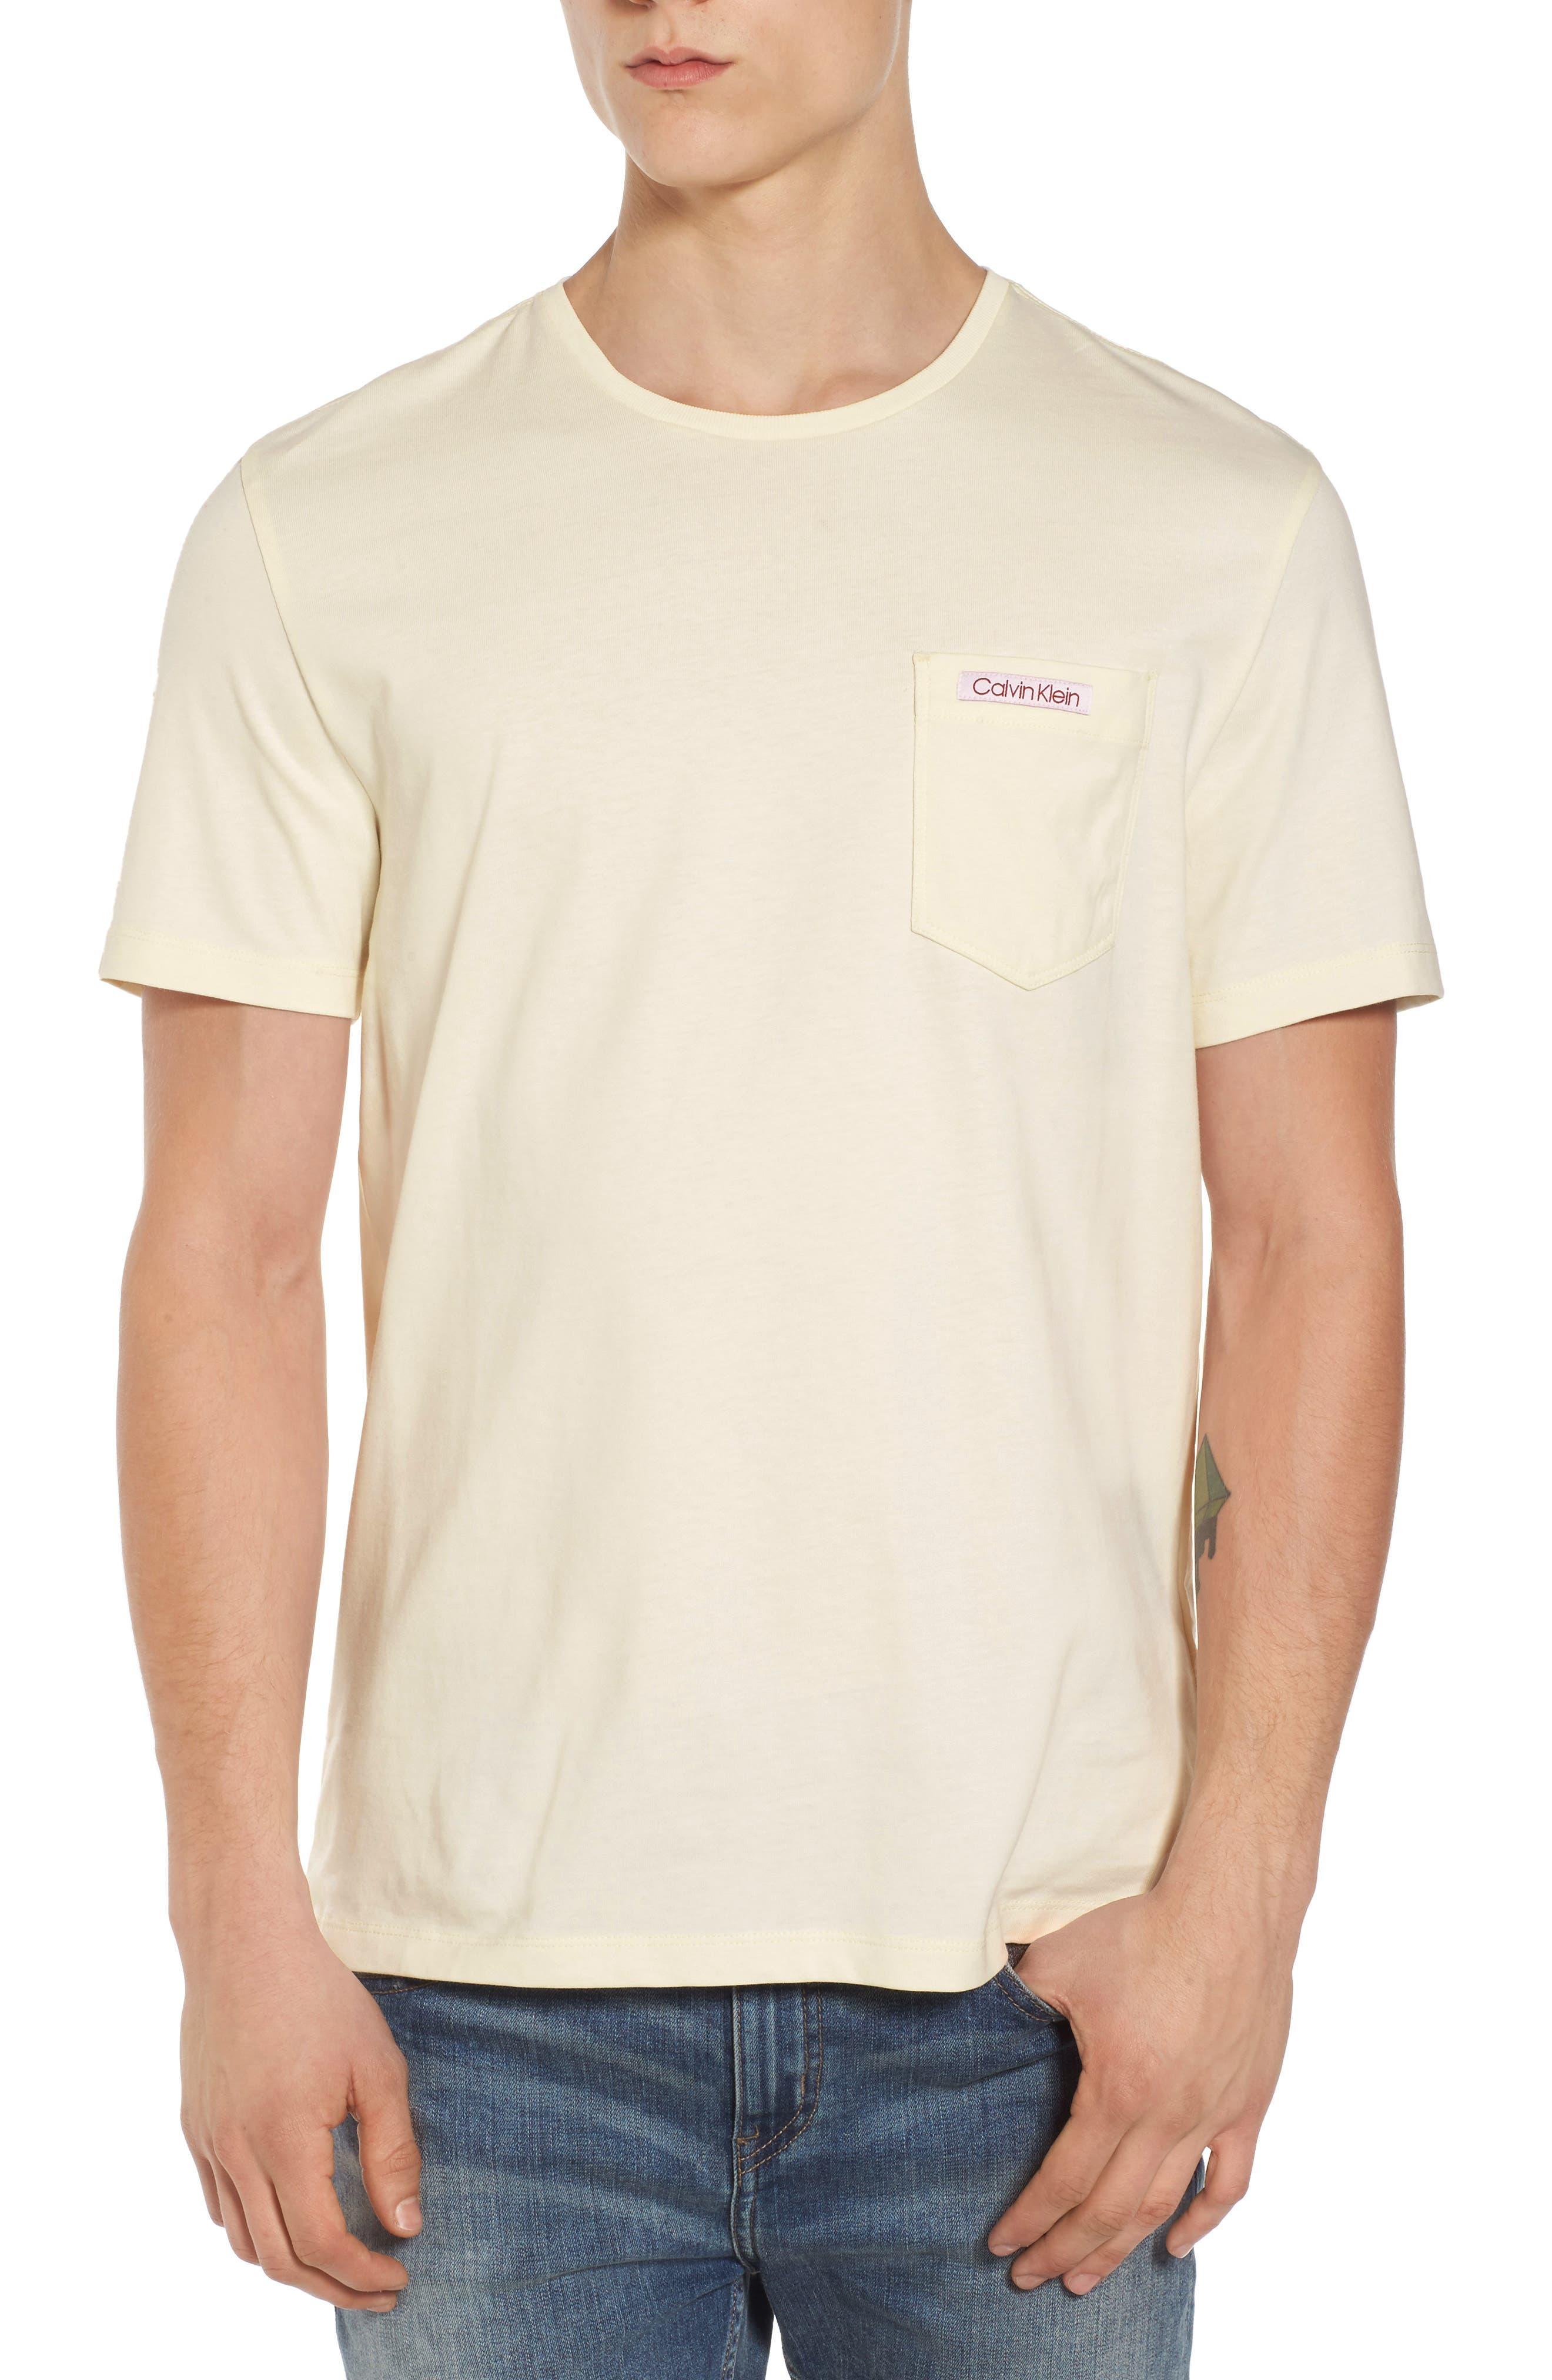 Main Image - Calvin Klein Jeans Label Pocket T-Shirt